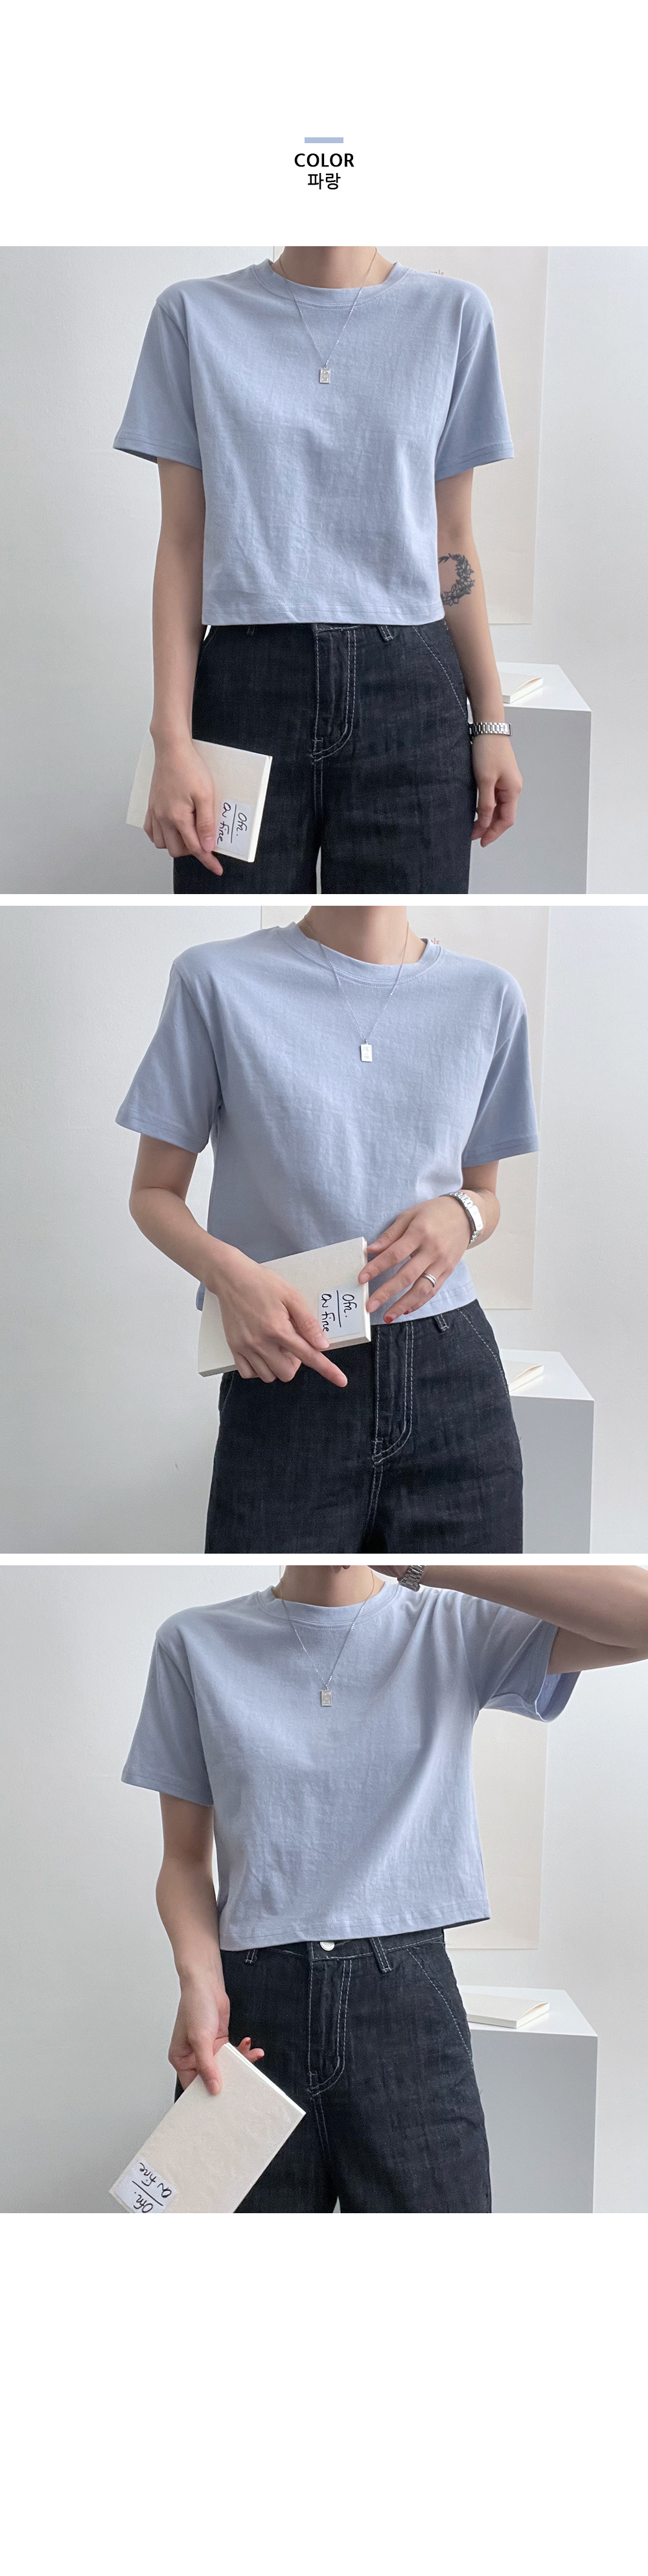 dress model image-S1L11